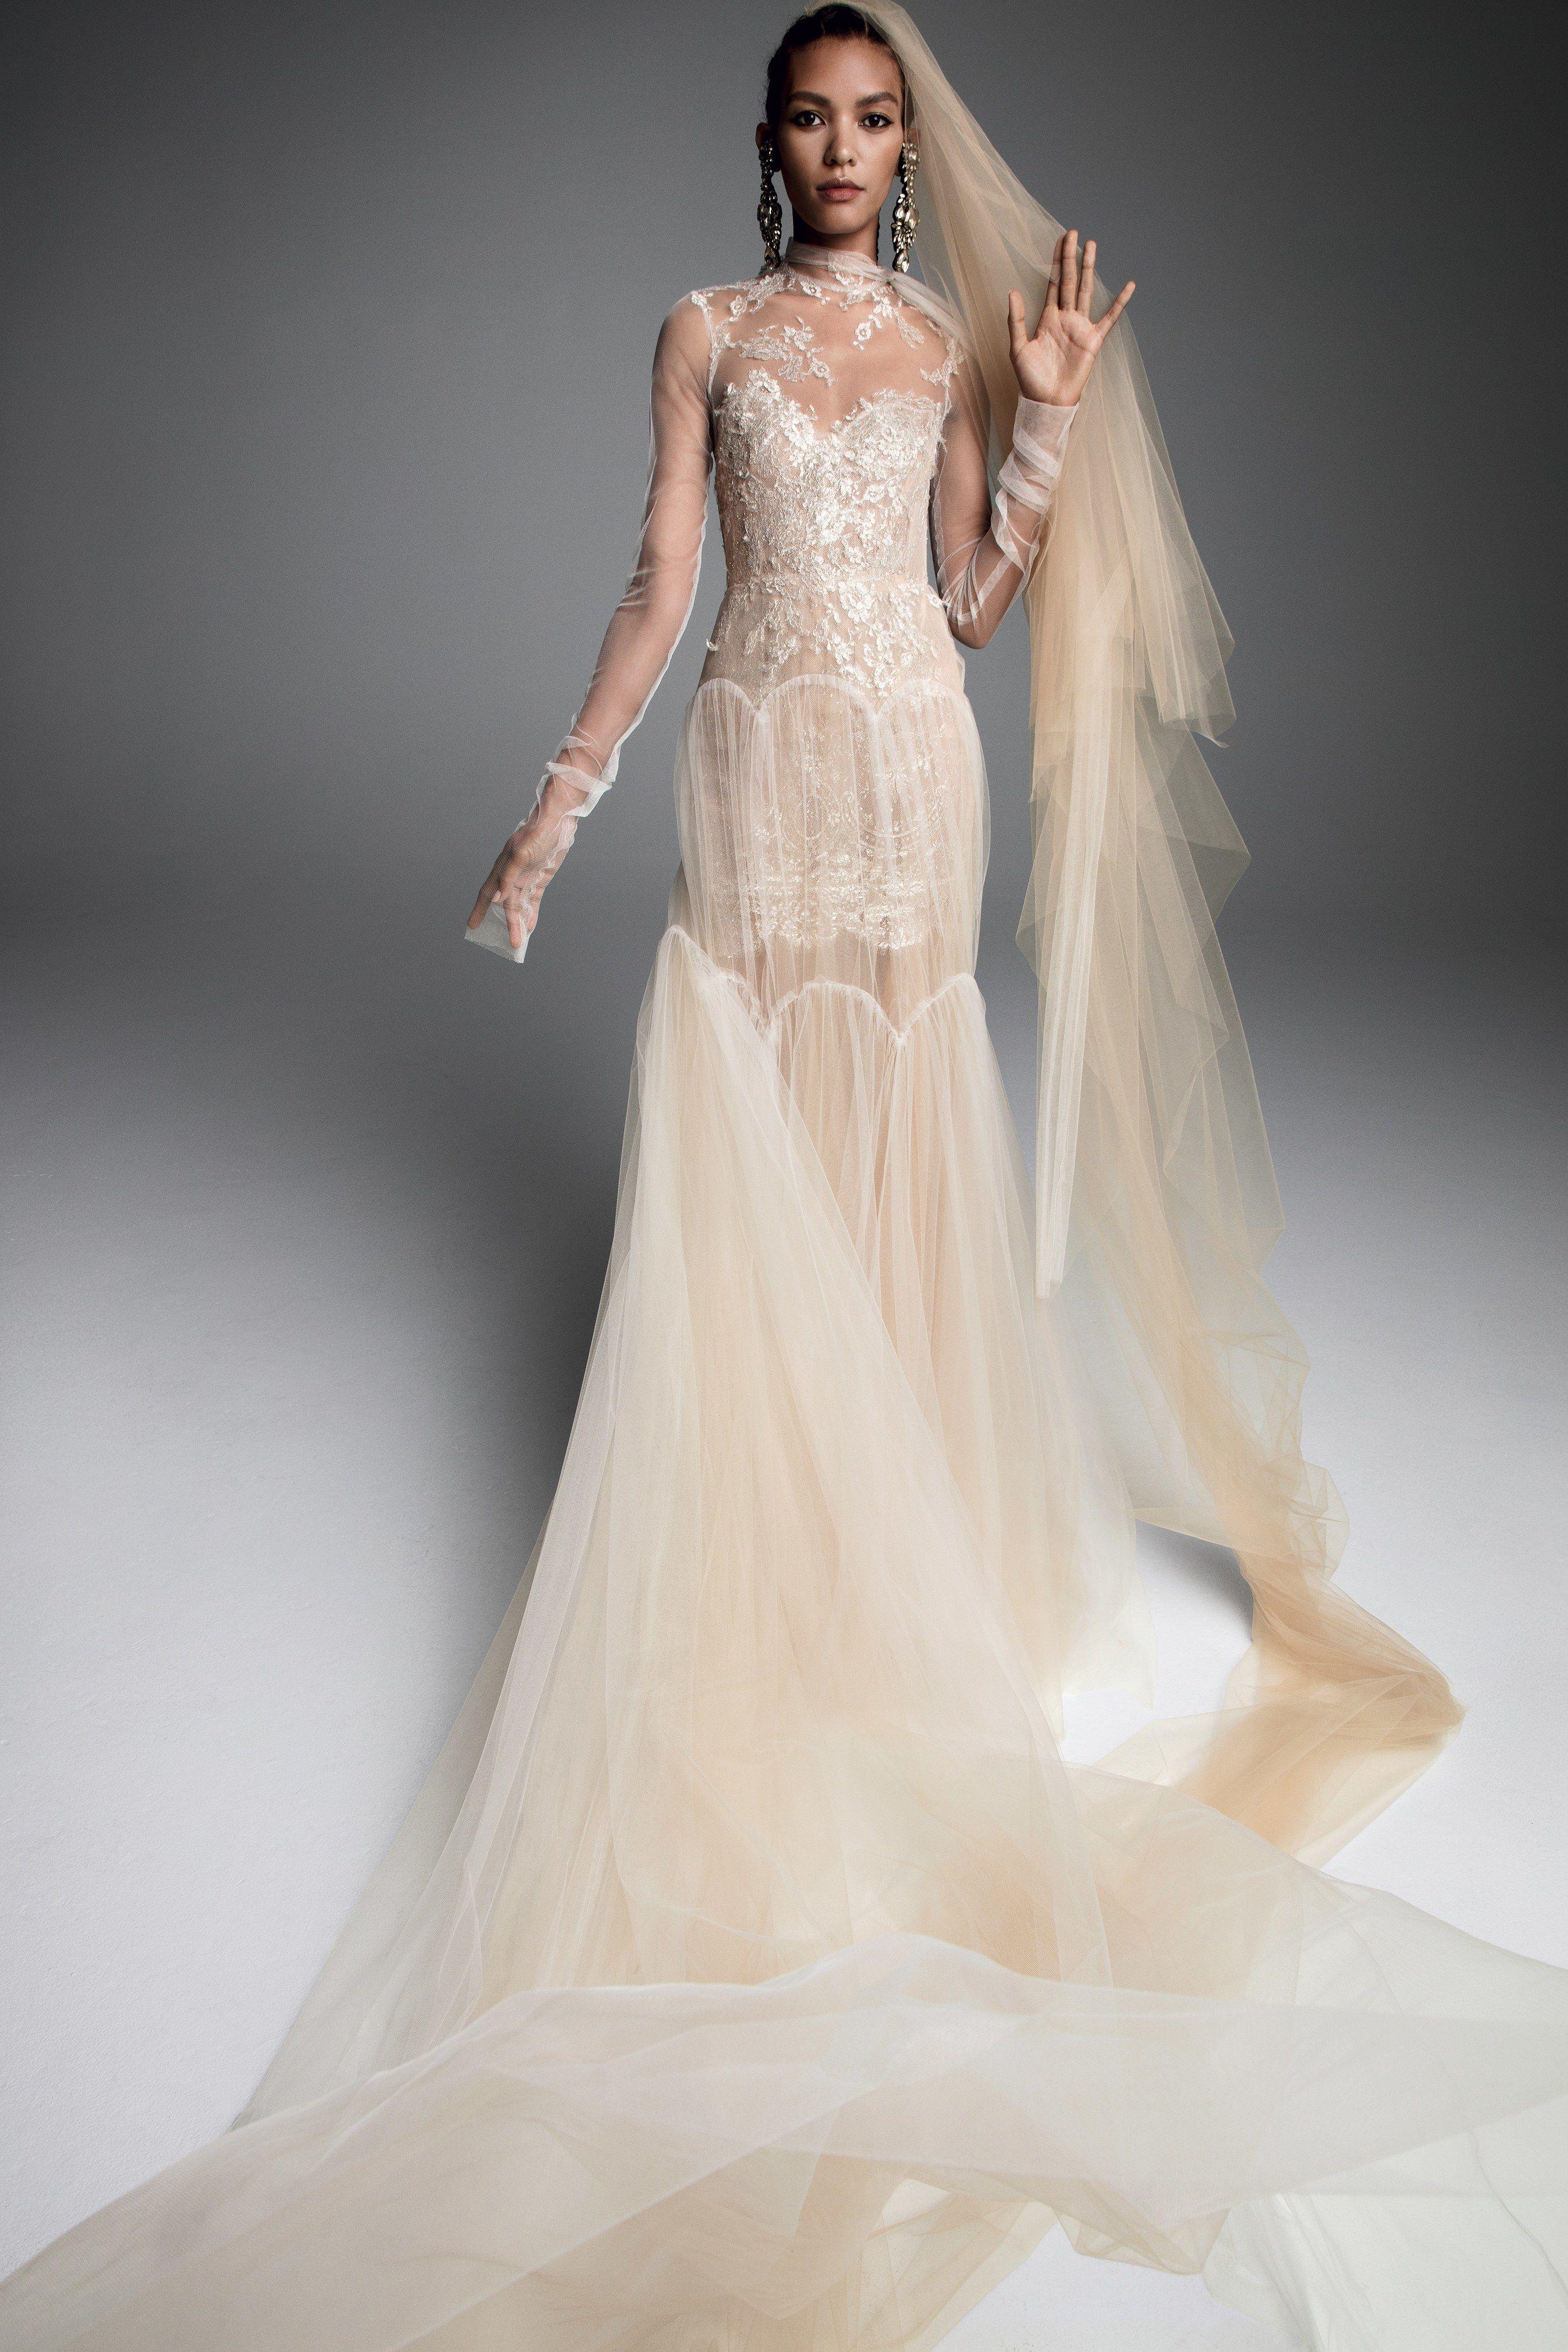 70 Best Bohemian Wedding Dresses Boho Dress Ideas For Hippie Brides: Desert Country Wedding Dresses At Websimilar.org